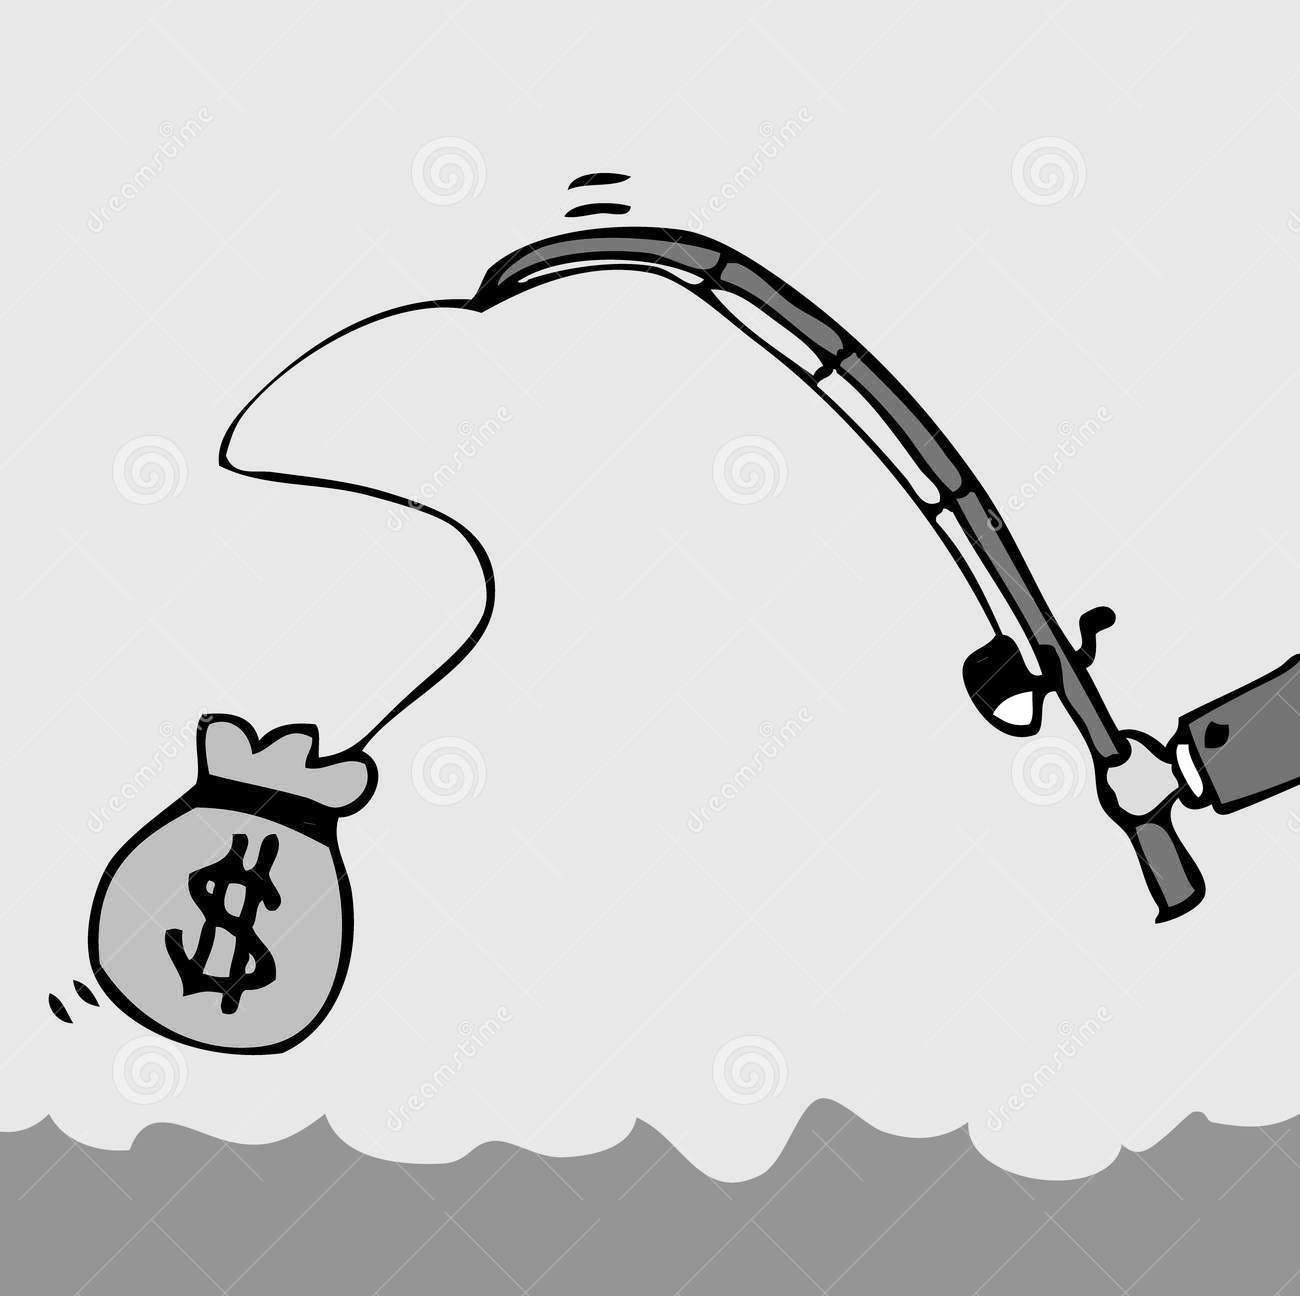 fishing-money-illustration-cartoon-businessman-bag-32571345